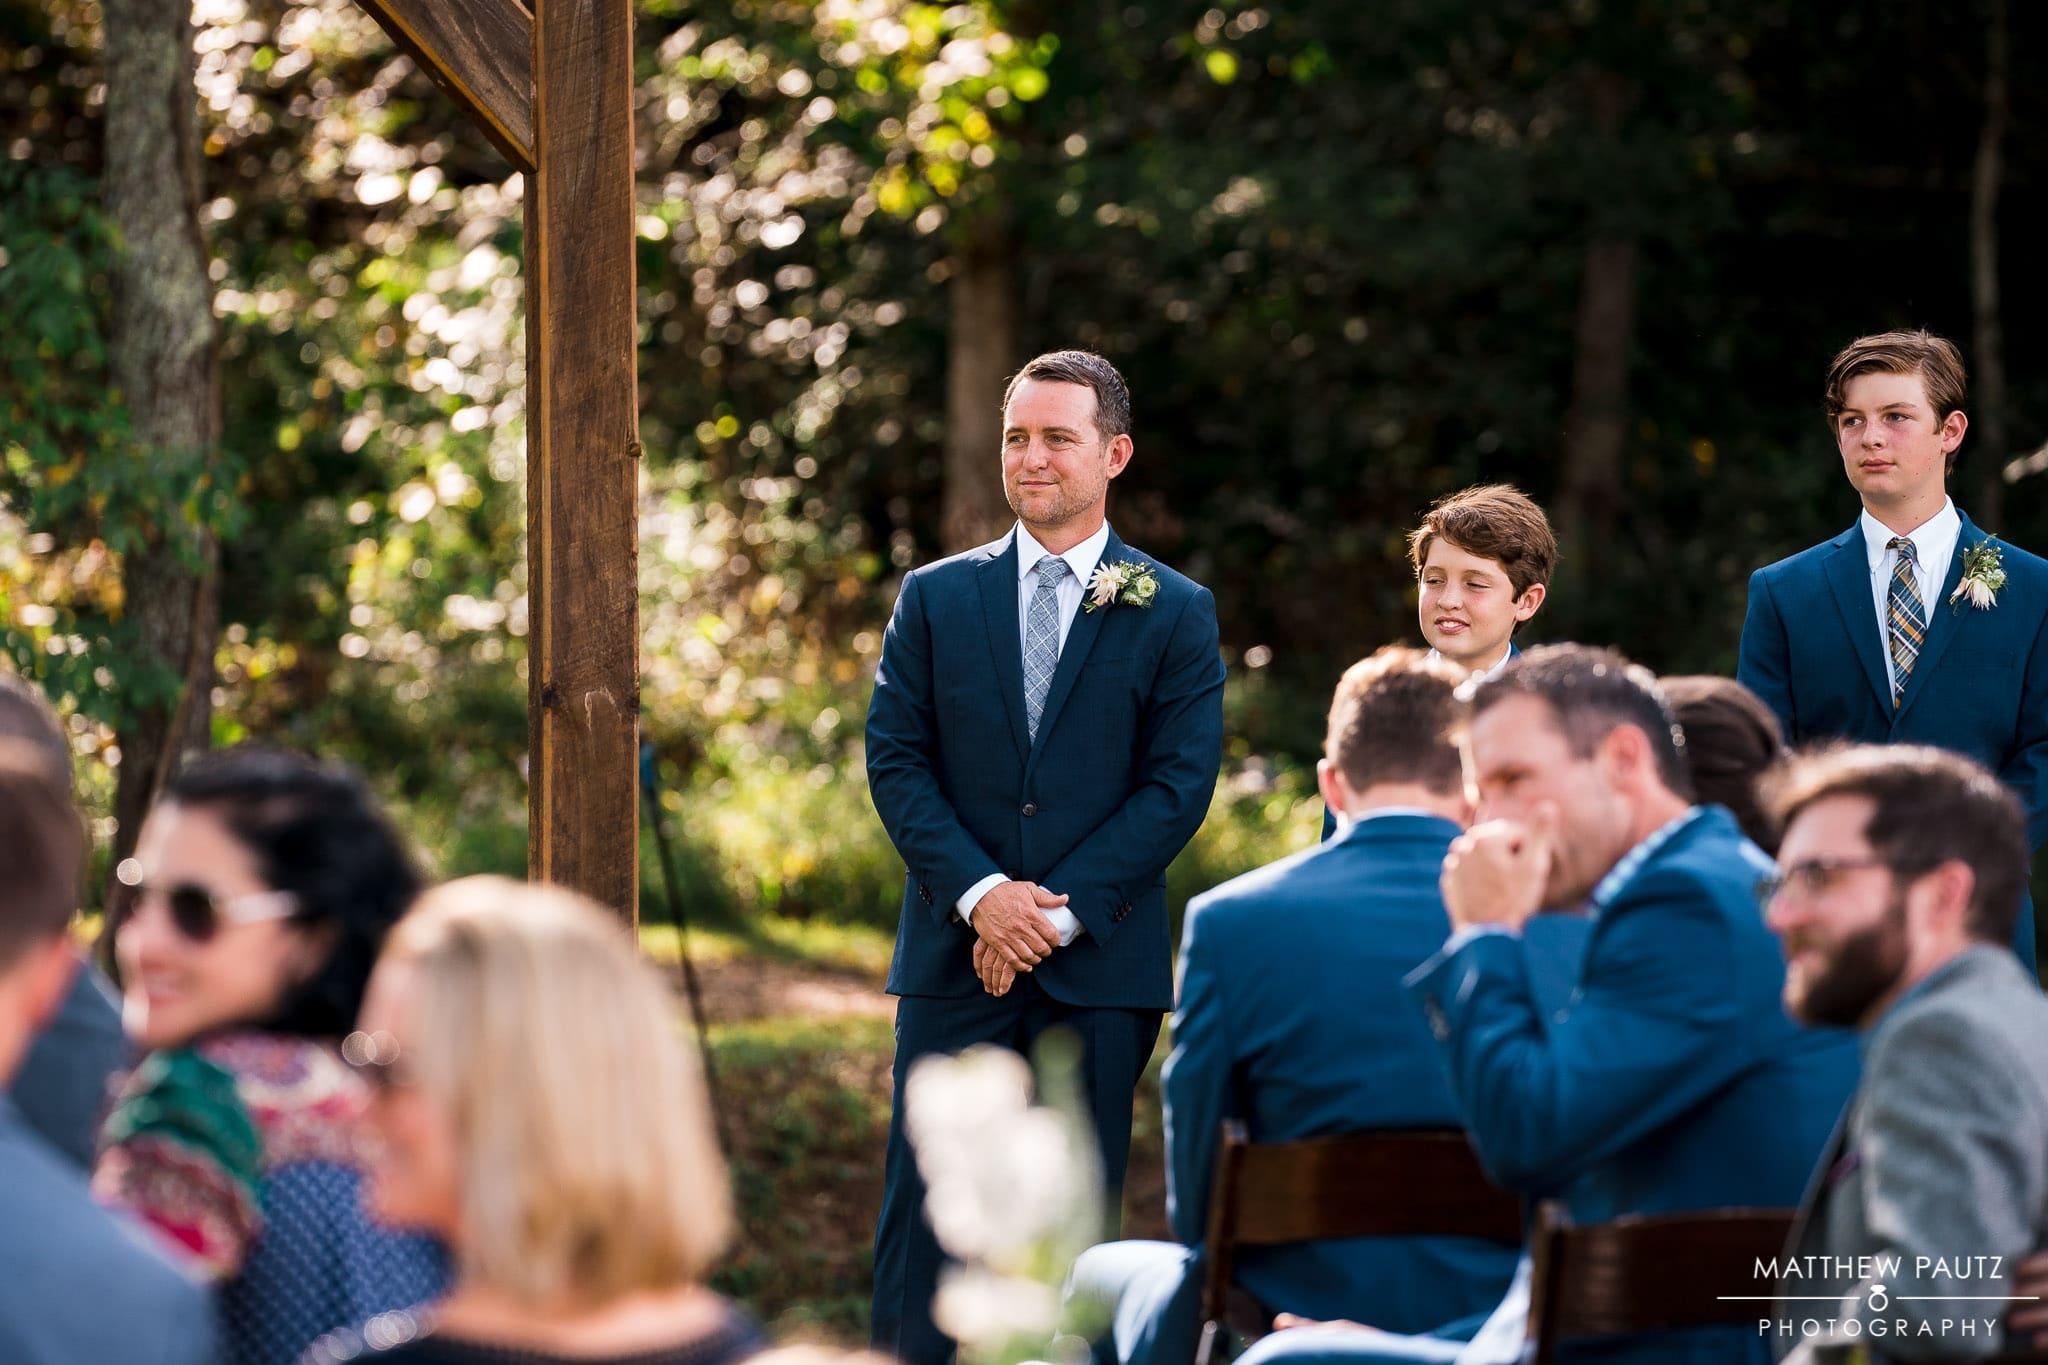 Outdoor wedding ceremony at Junebug Retro resort